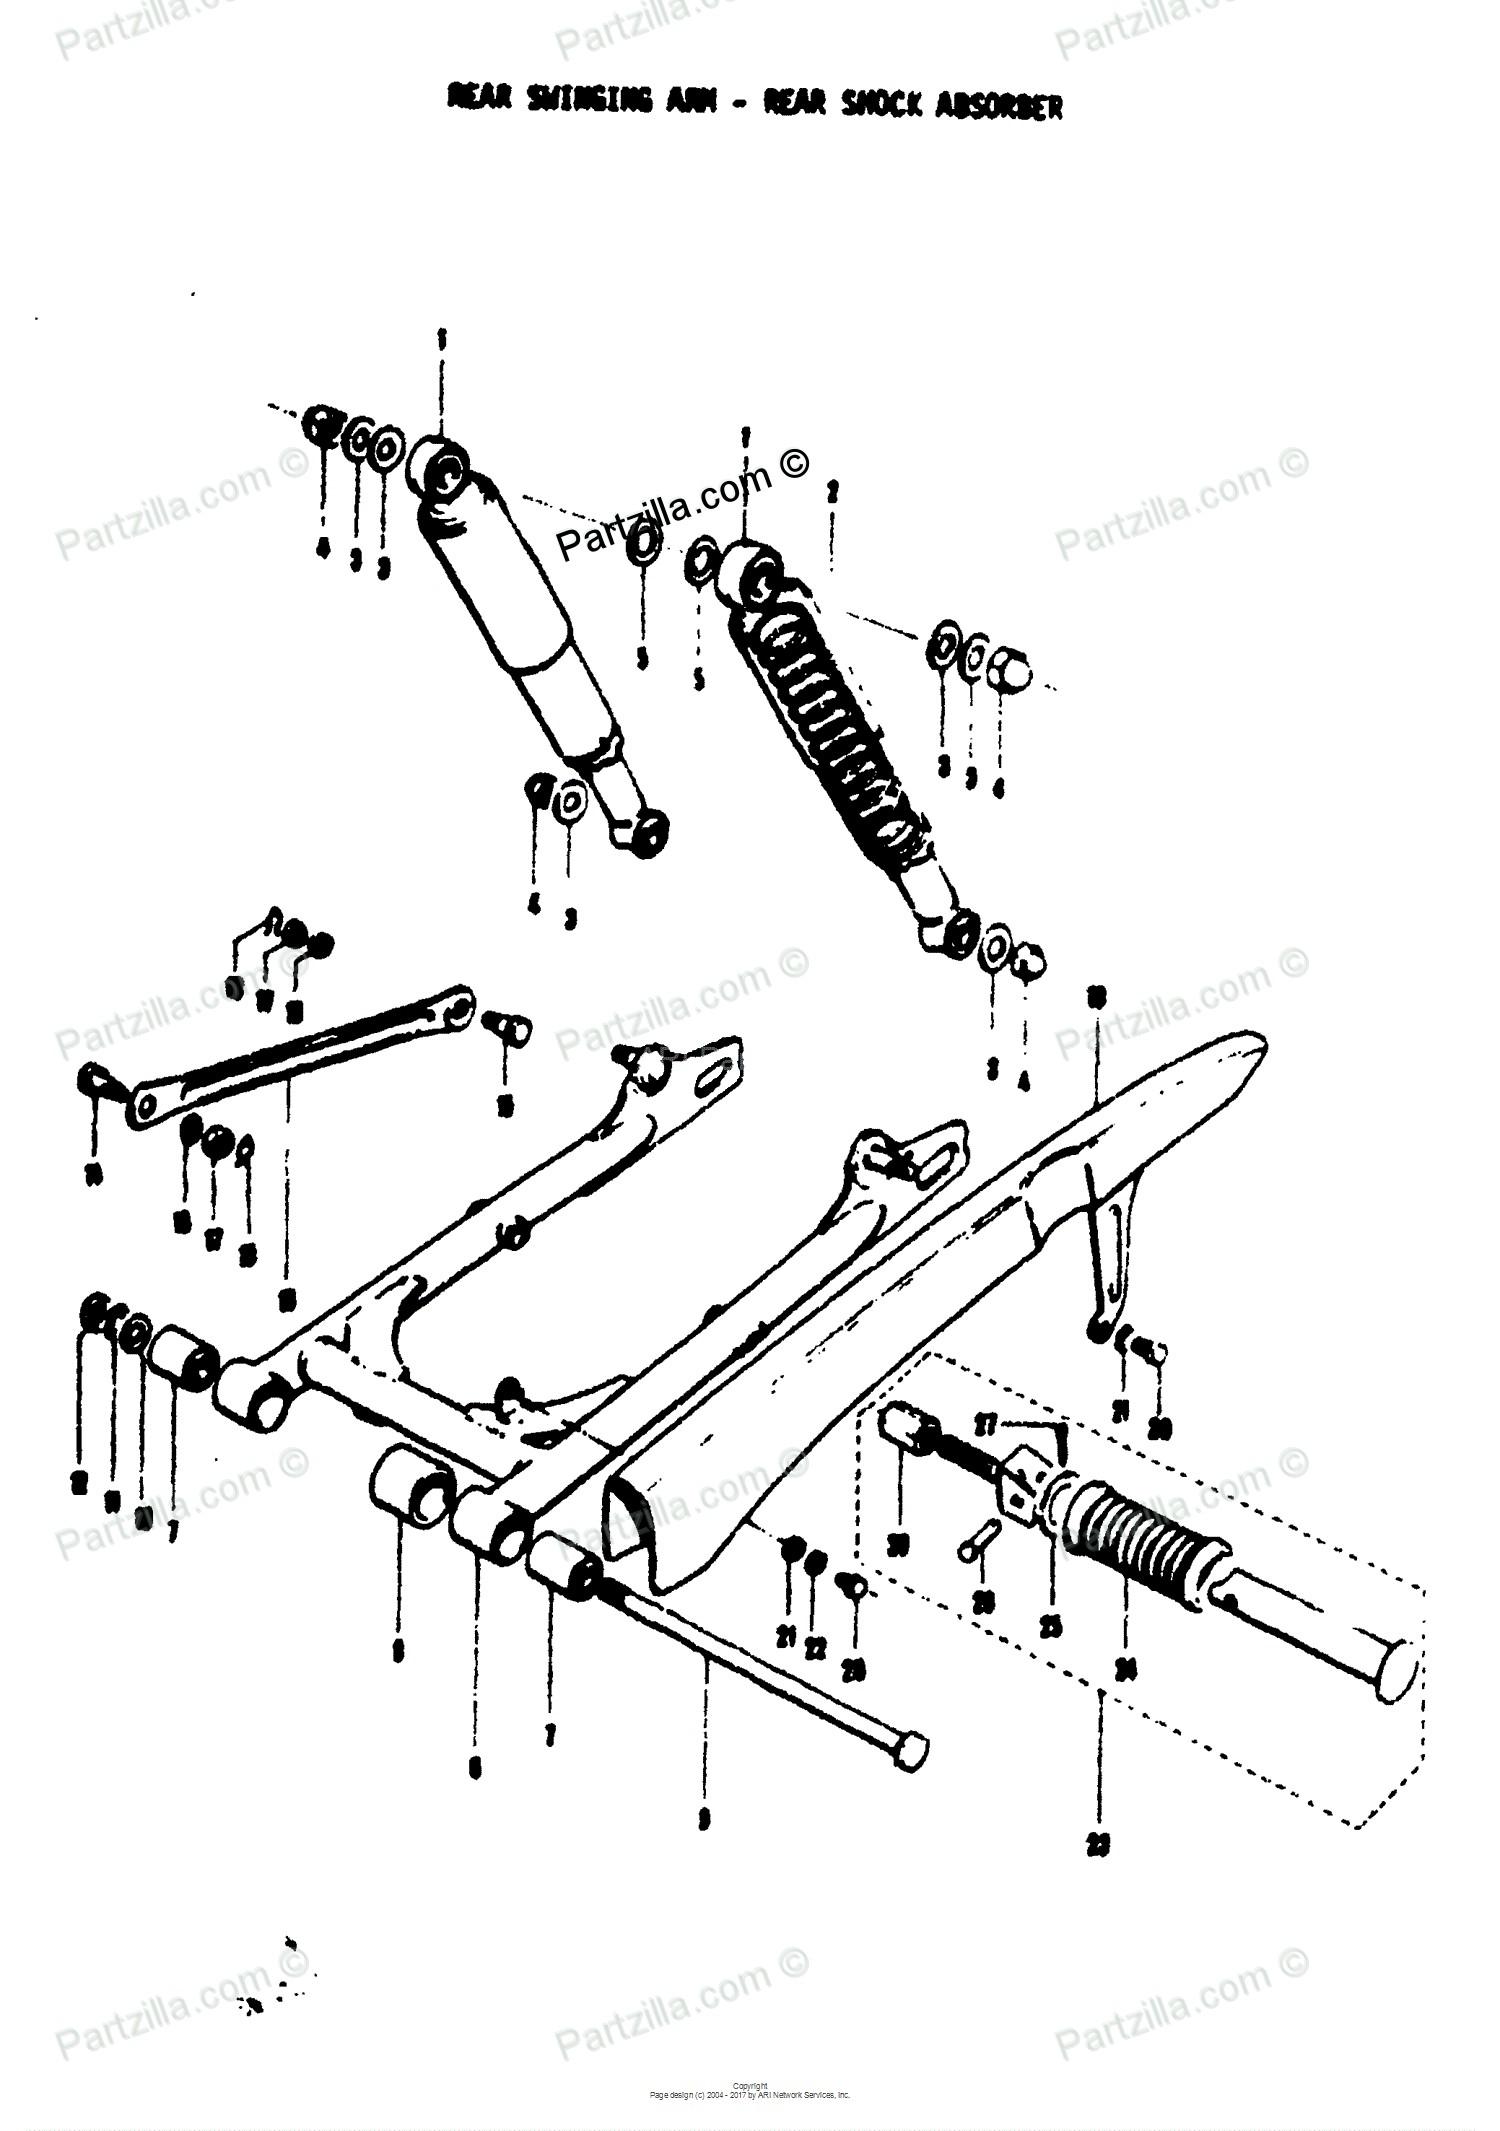 Car Shock Absorber Diagram Suzuki Motorcycle 1971 Oem Parts Diagram for Rear Swinging Arm Rear Of Car Shock Absorber Diagram